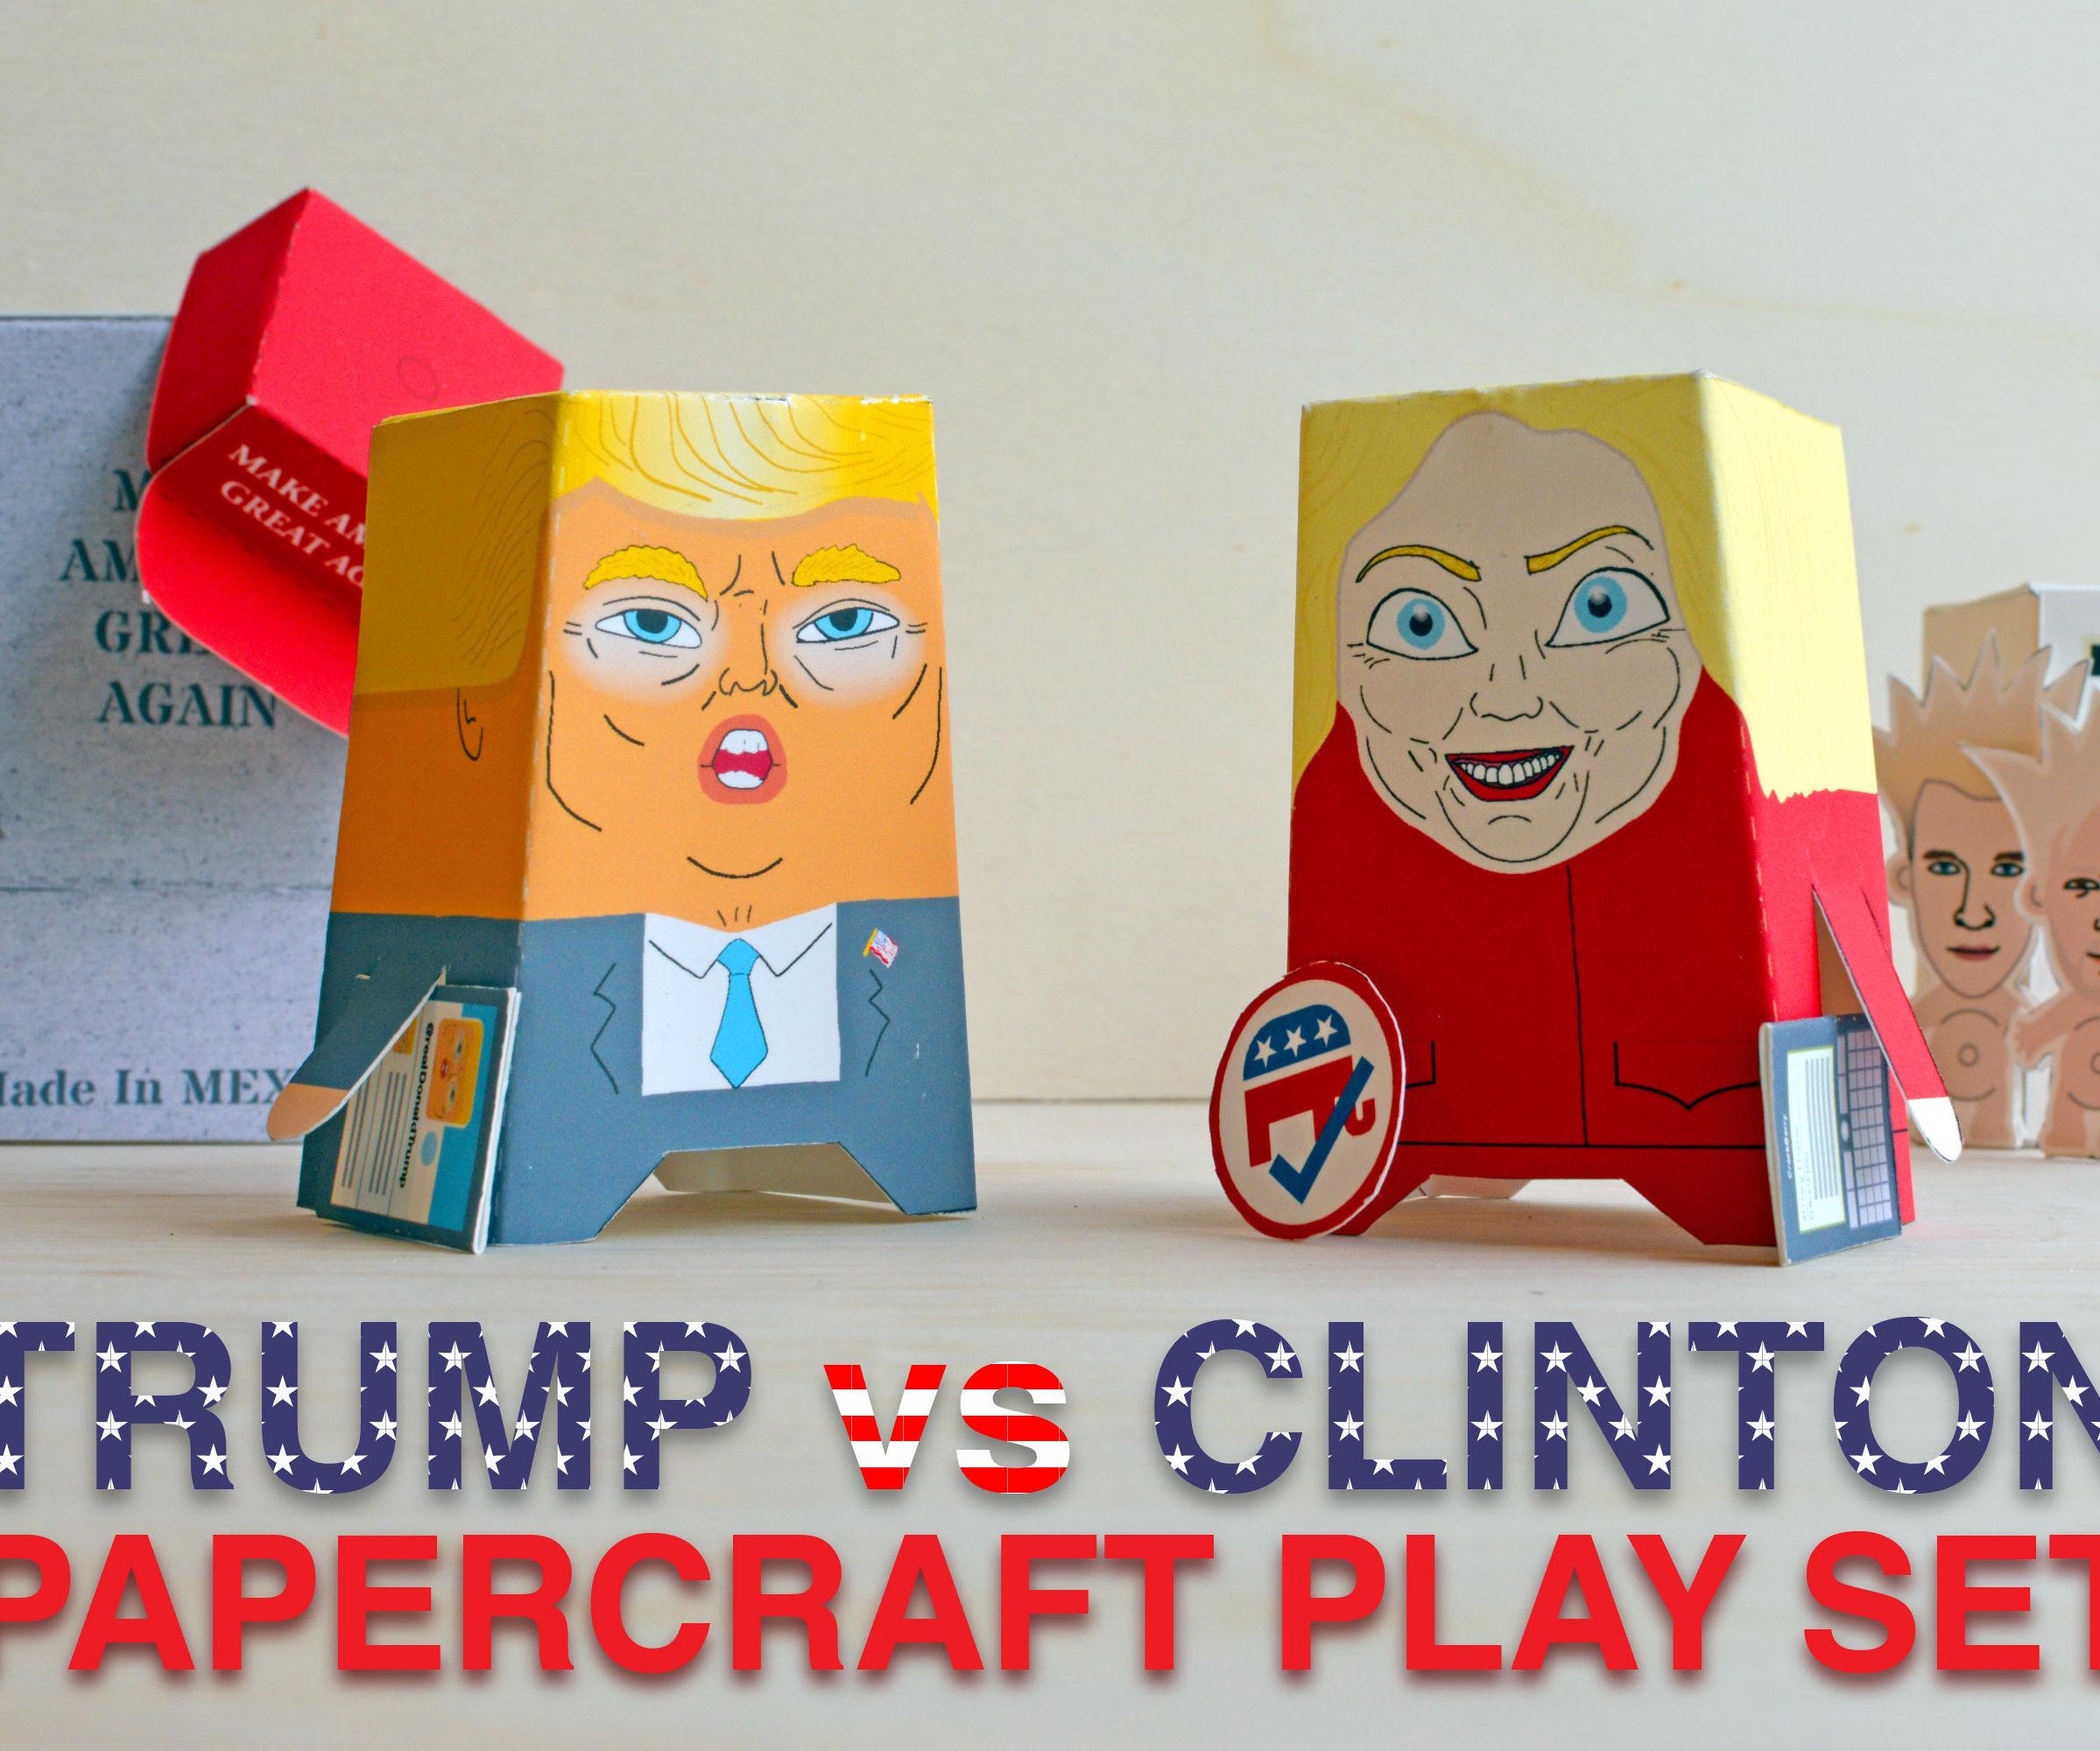 Trump vs Clinton Papercraft Play Set